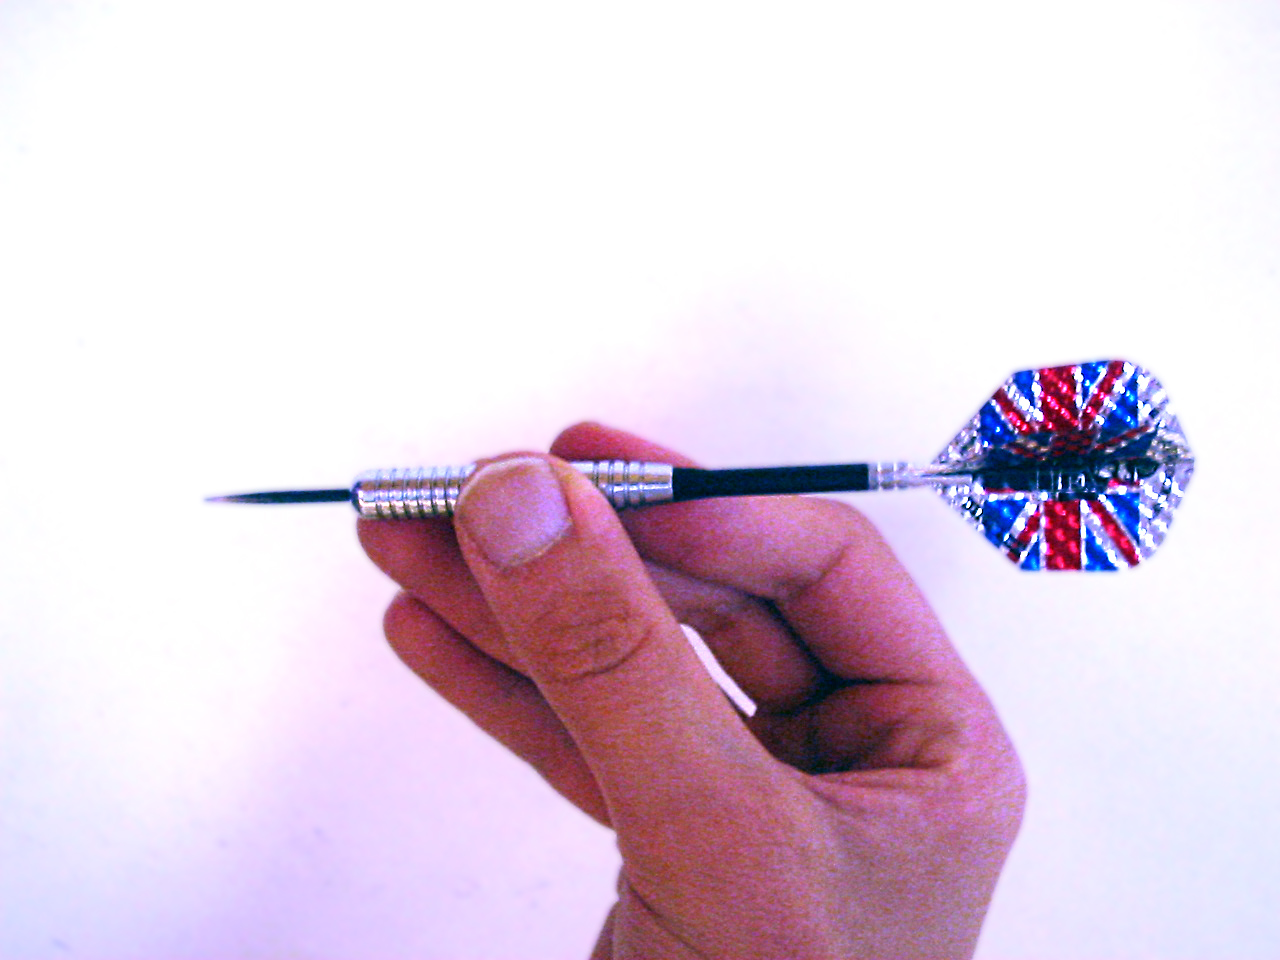 lets-play-darts-1458379.jpg